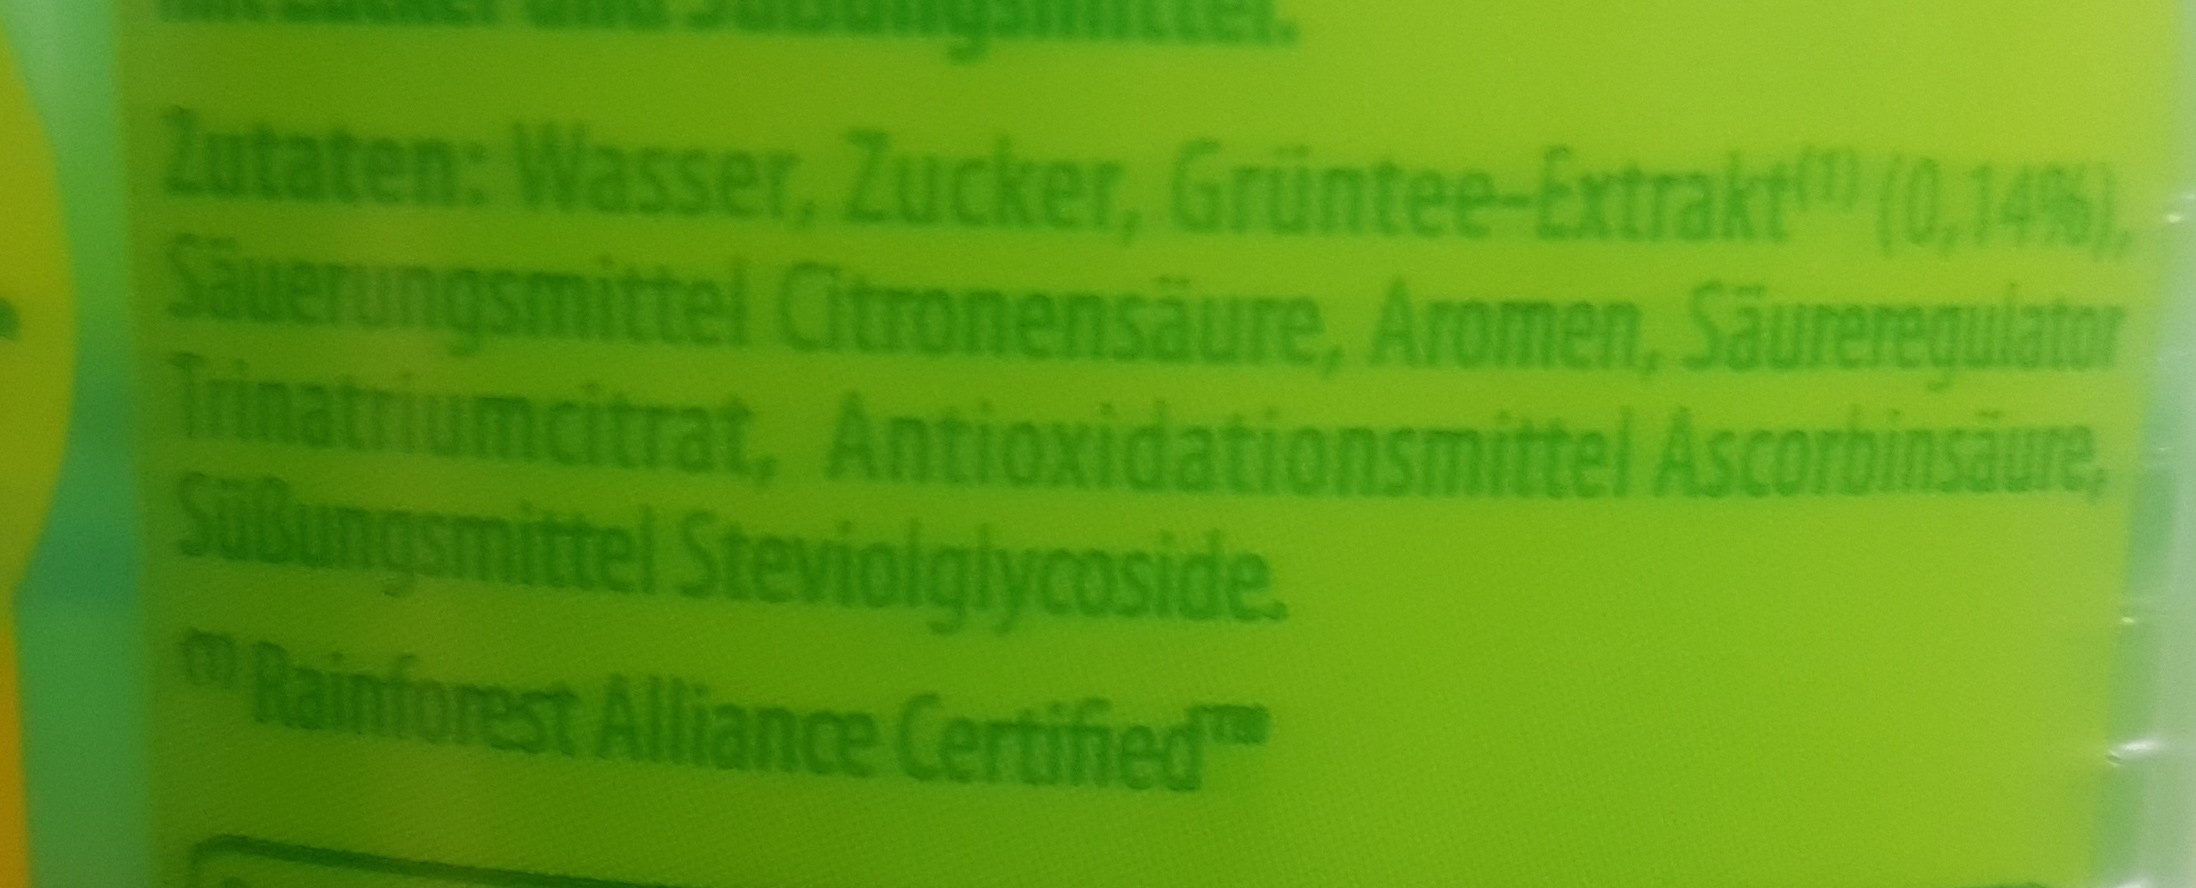 Lipton Green Ice Tea Lime - Ingredients - en